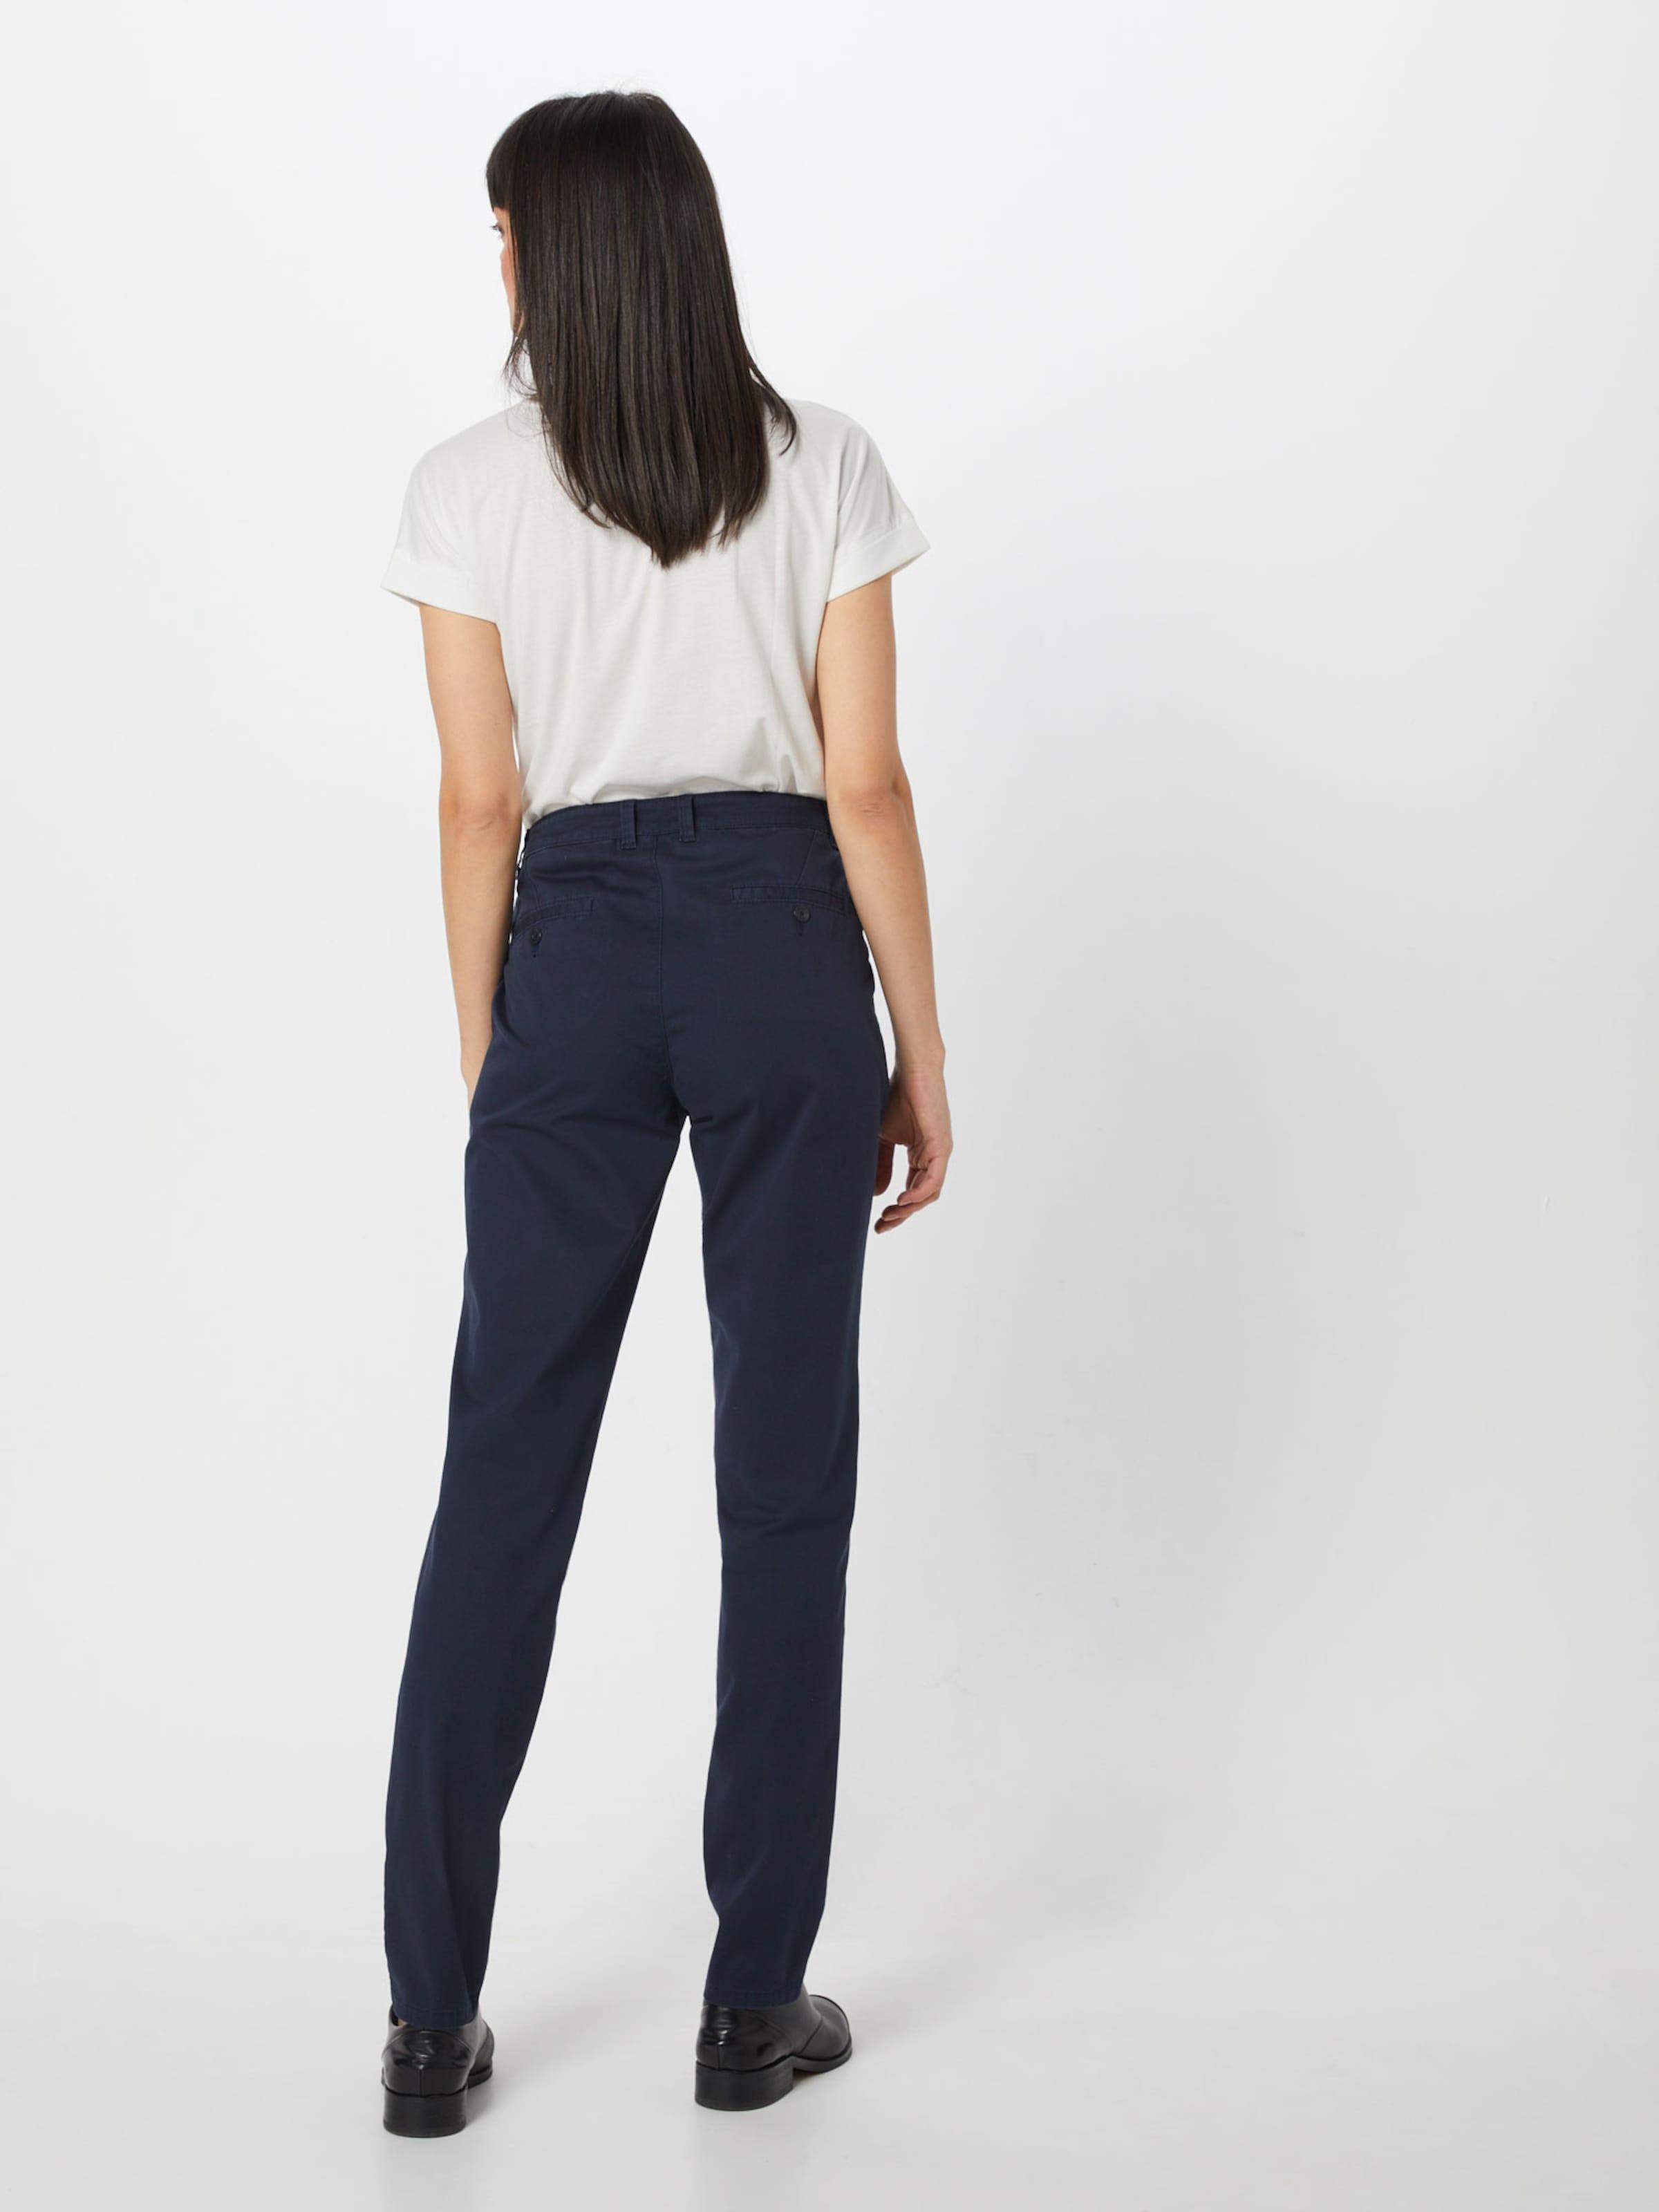 Esprit Pantalon En Roi Chino Bleu VUzMqSp